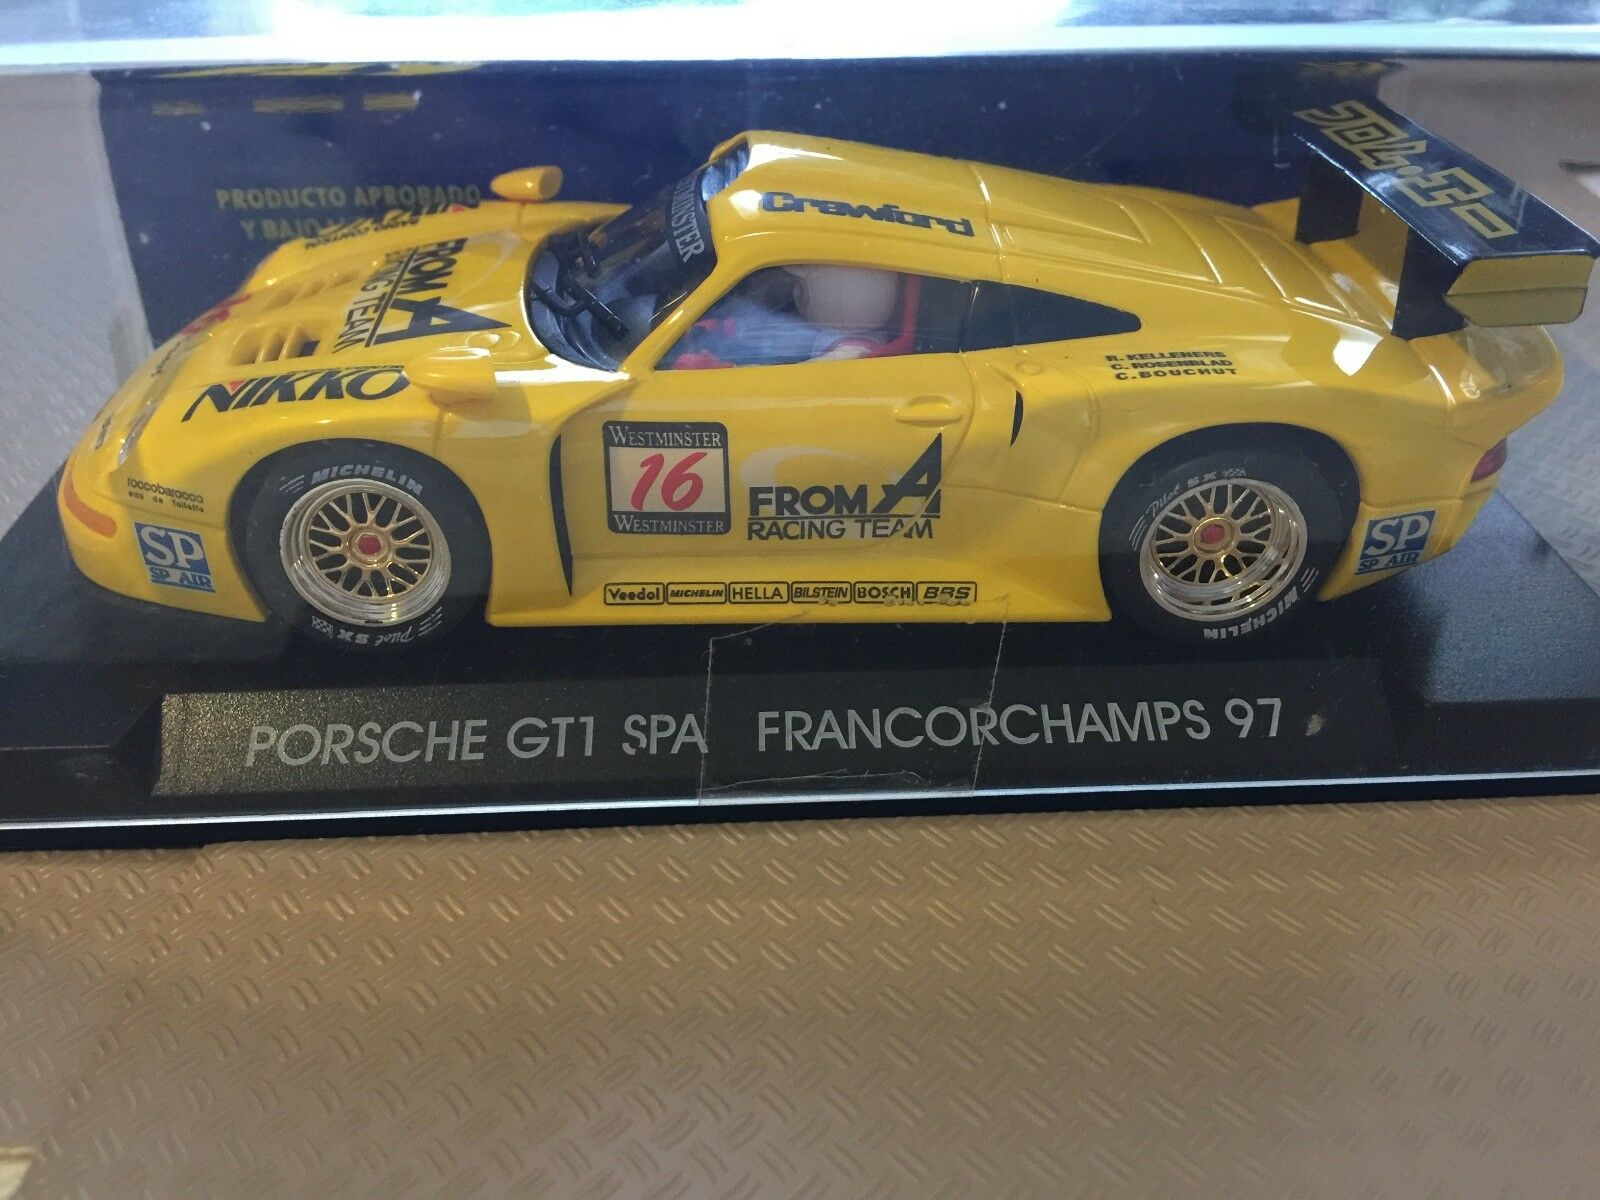 FLY A36 PORSCHE 911 GT1 SPA FRANCORCHAMPS'97 KELLENERS-pinkNBLAD-BOUCHUT